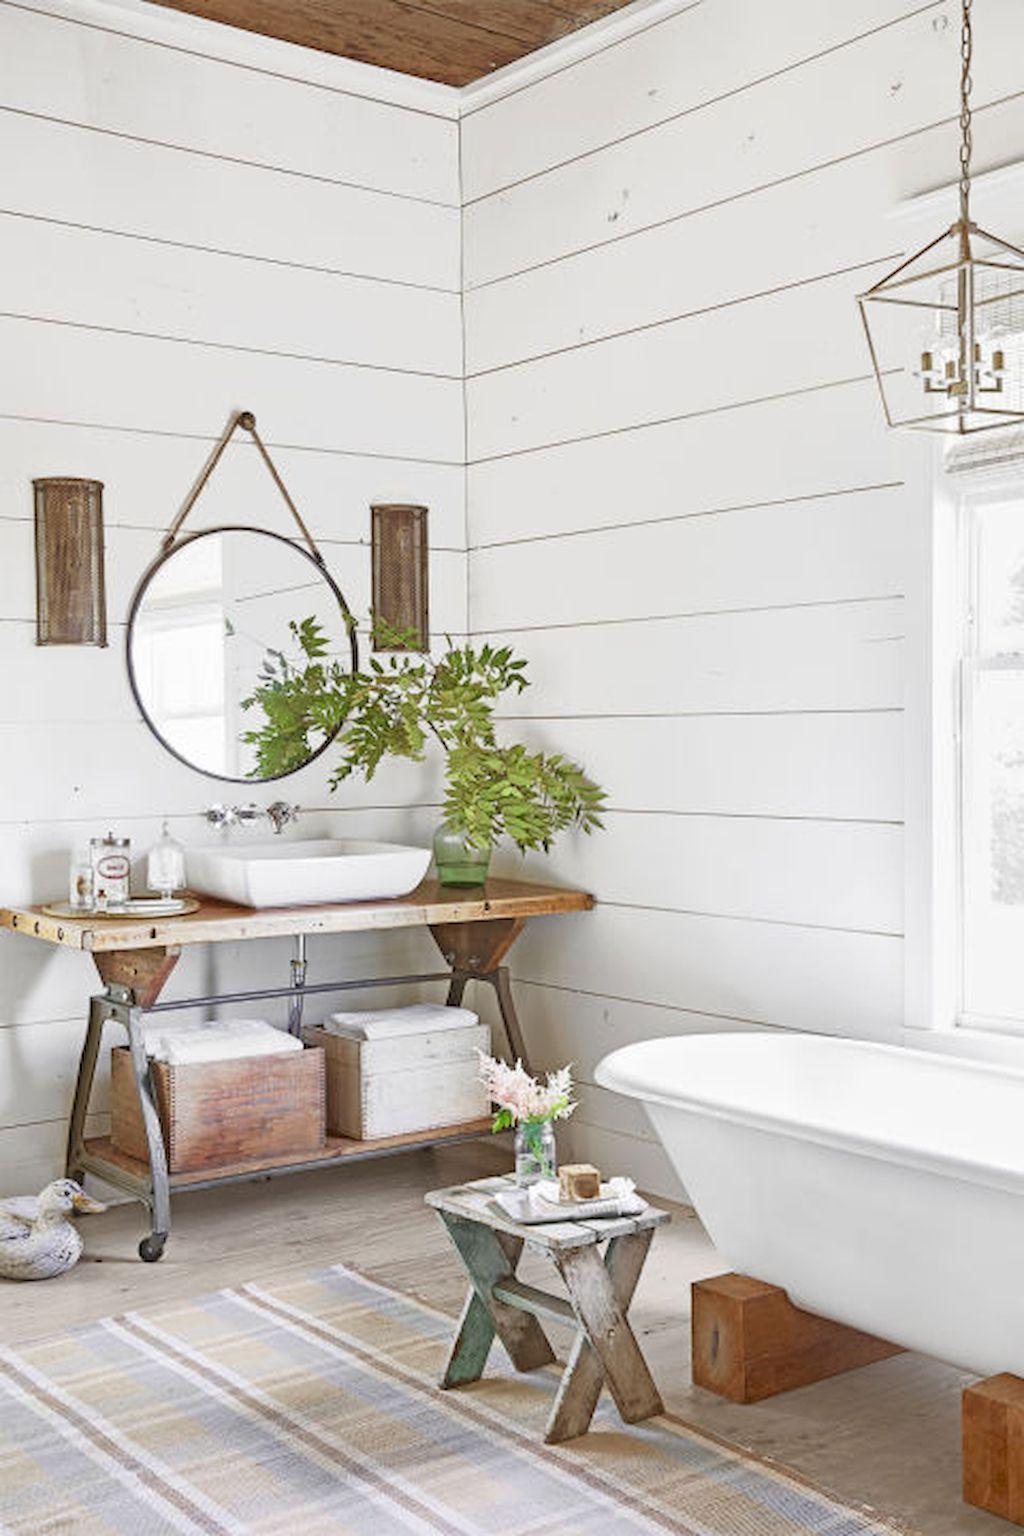 40 Stunning Rustic Bathroom Decorating Ideas | Pinterest | Rustic ...